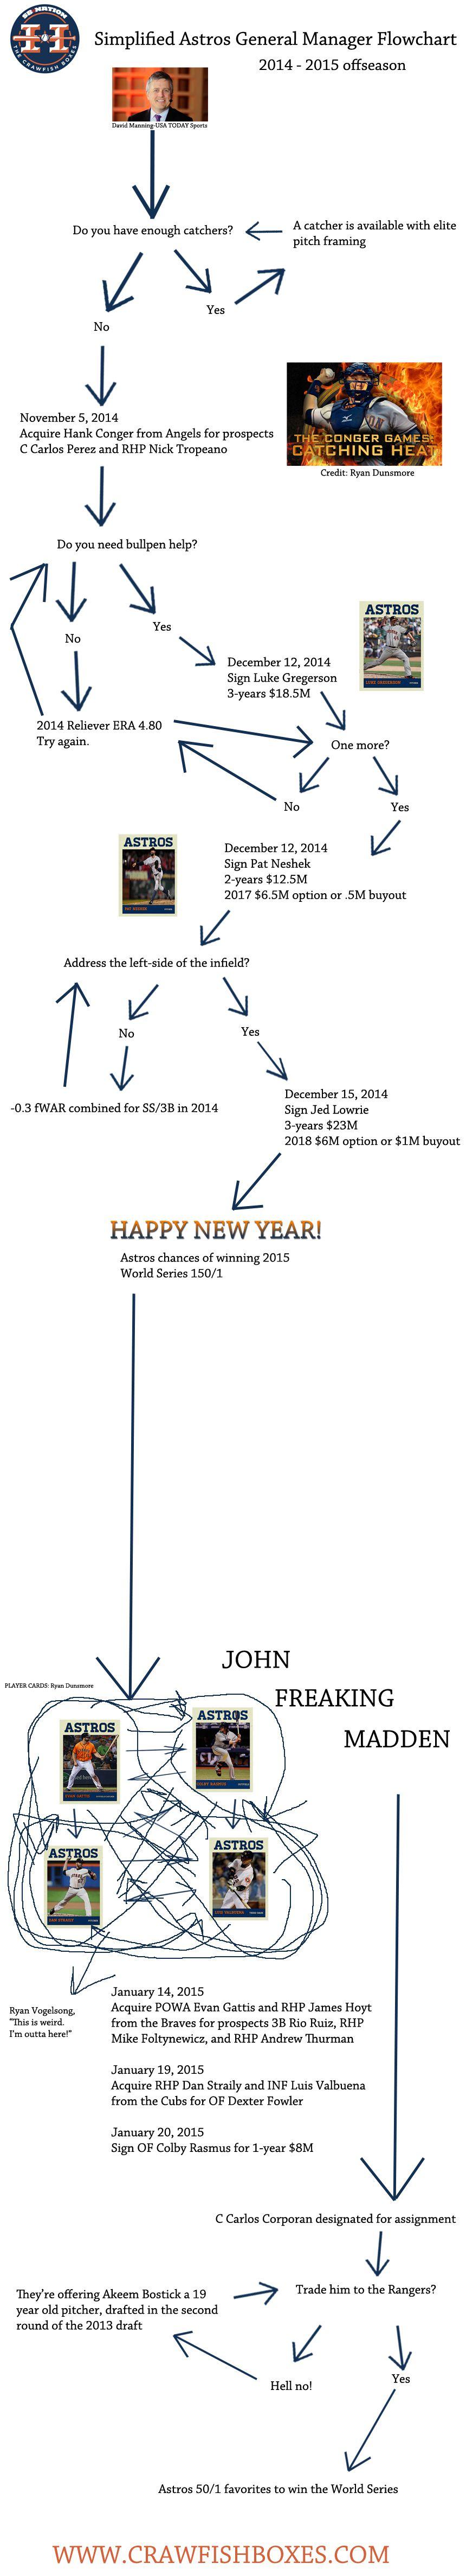 2014-2015 Offseason Flowchart